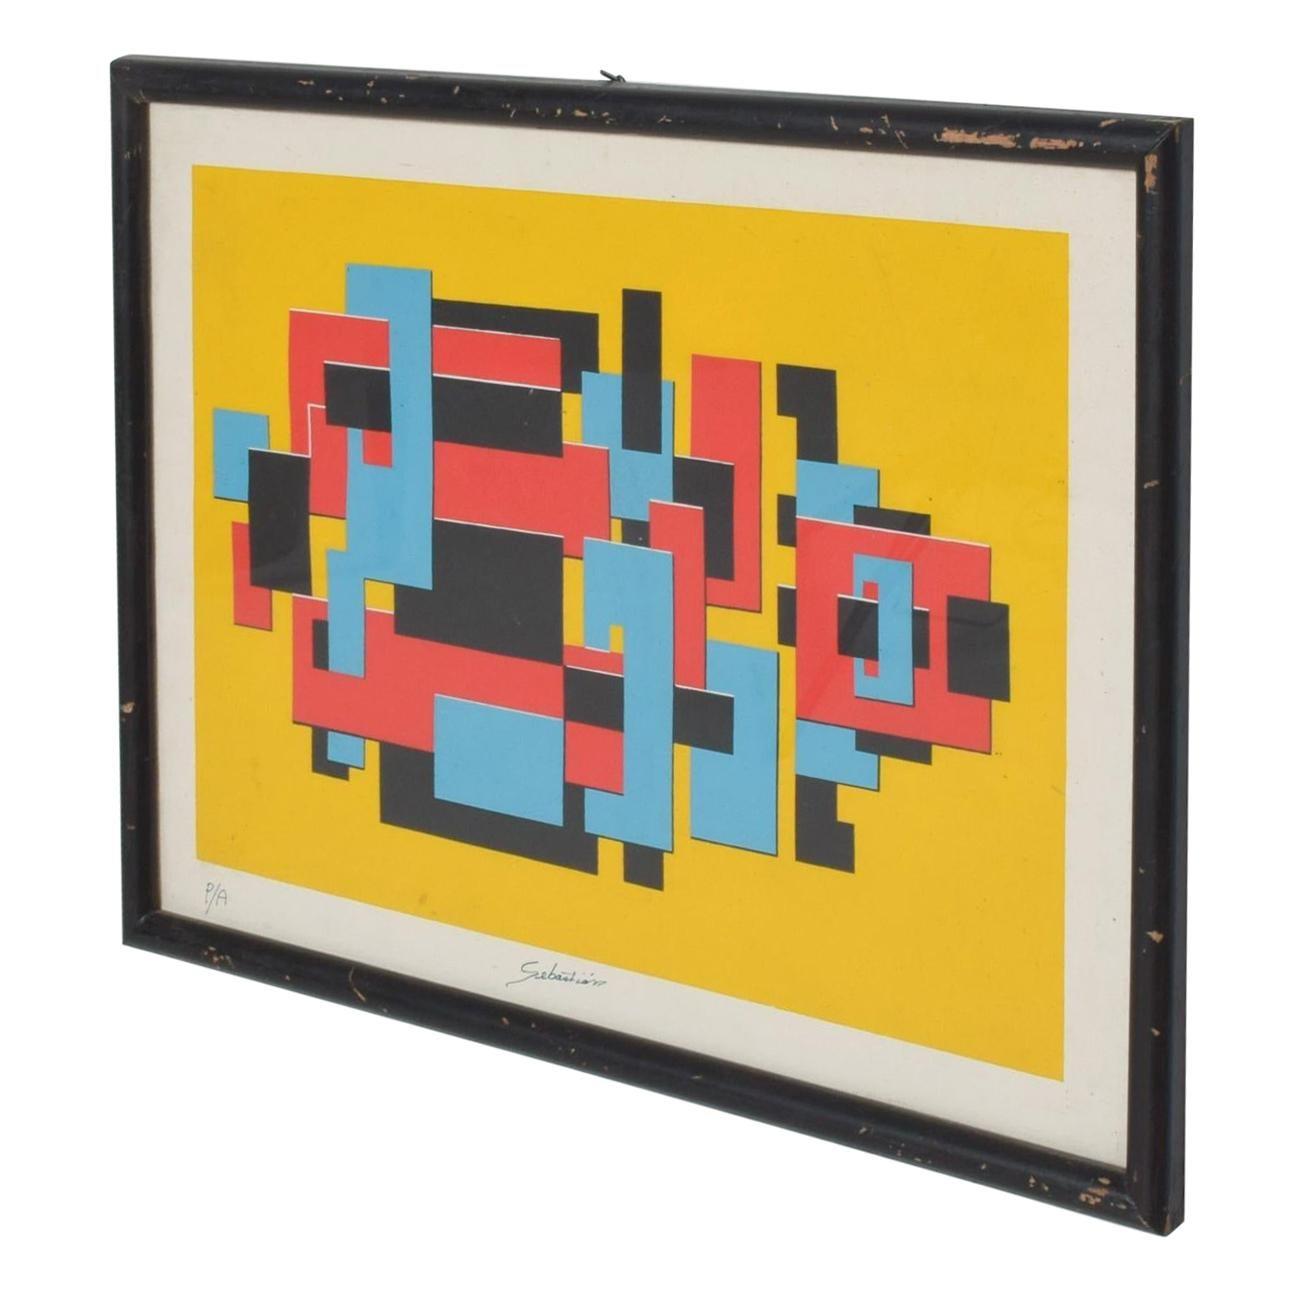 Modern Abstract Lithograph by Mexican Sculptor, Enrique Carbajal, Sebastian 1980